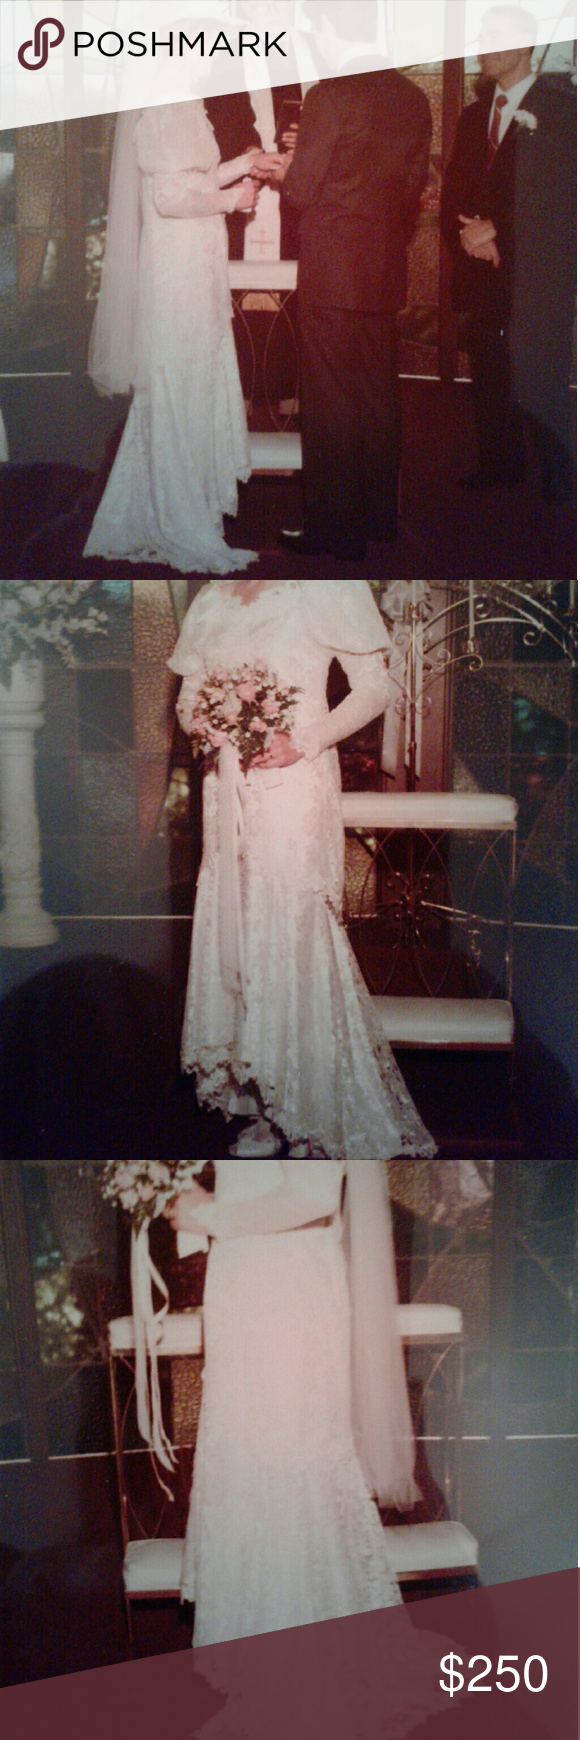 Cream colored vintage wedding dresses  Vintage Wedding Dress